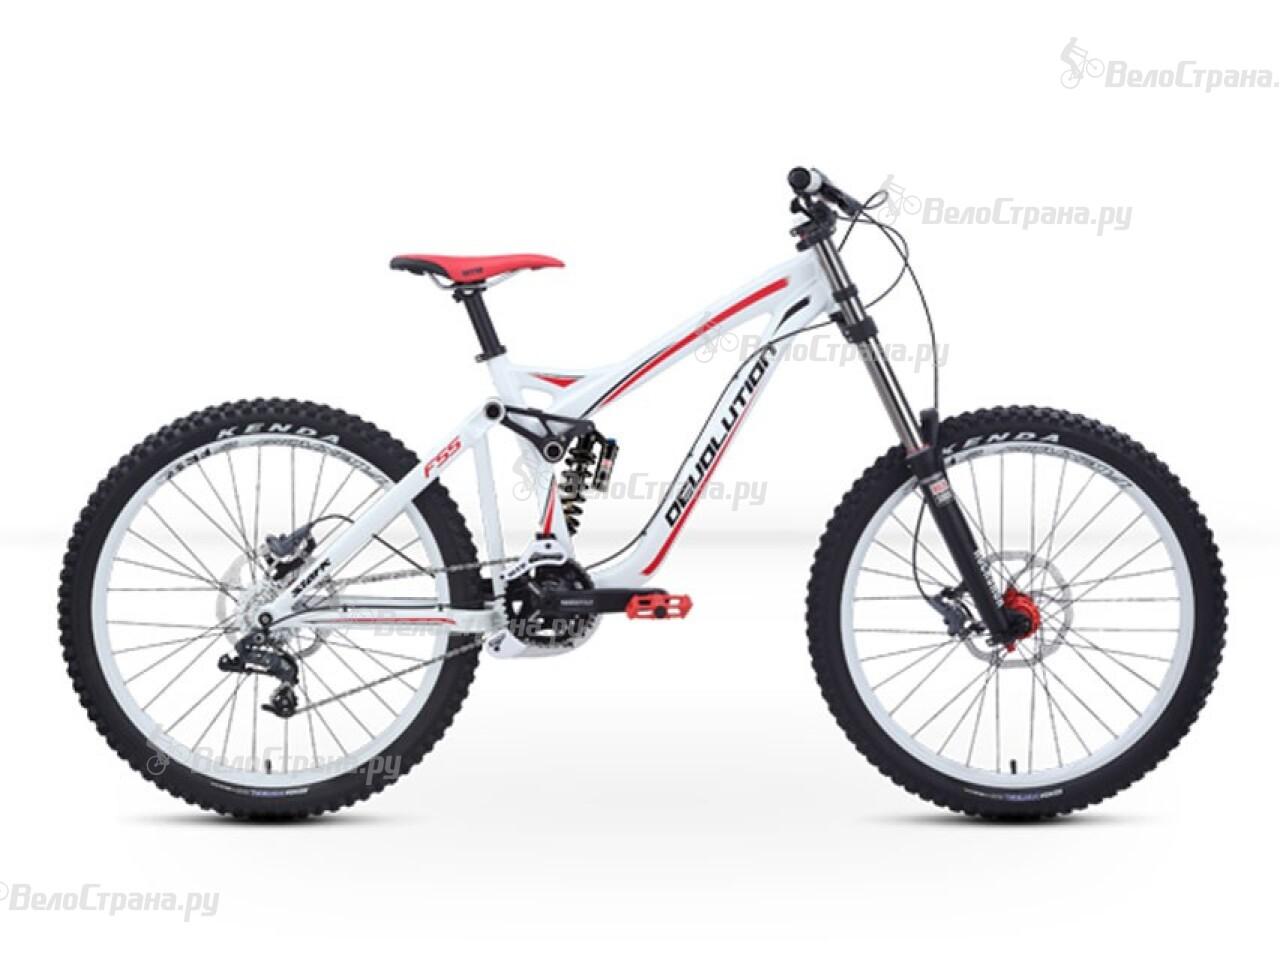 Велосипед Stark Devolution (2014) rockshox domain dual crown 2014